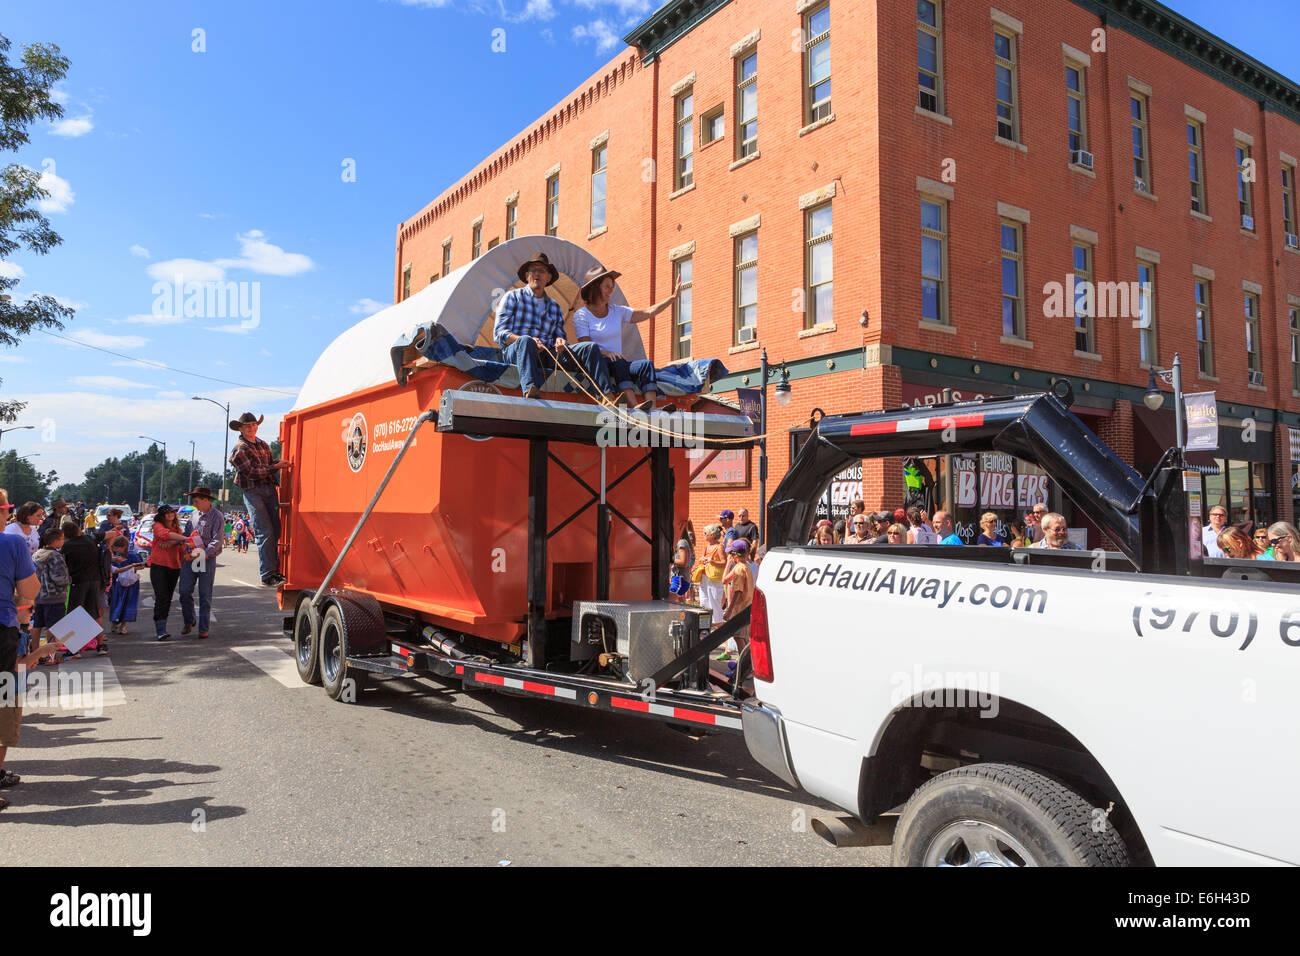 Loveland Colorado Usa 23 August 2014 A Parade Float Consisting Of Stock Photo Alamy